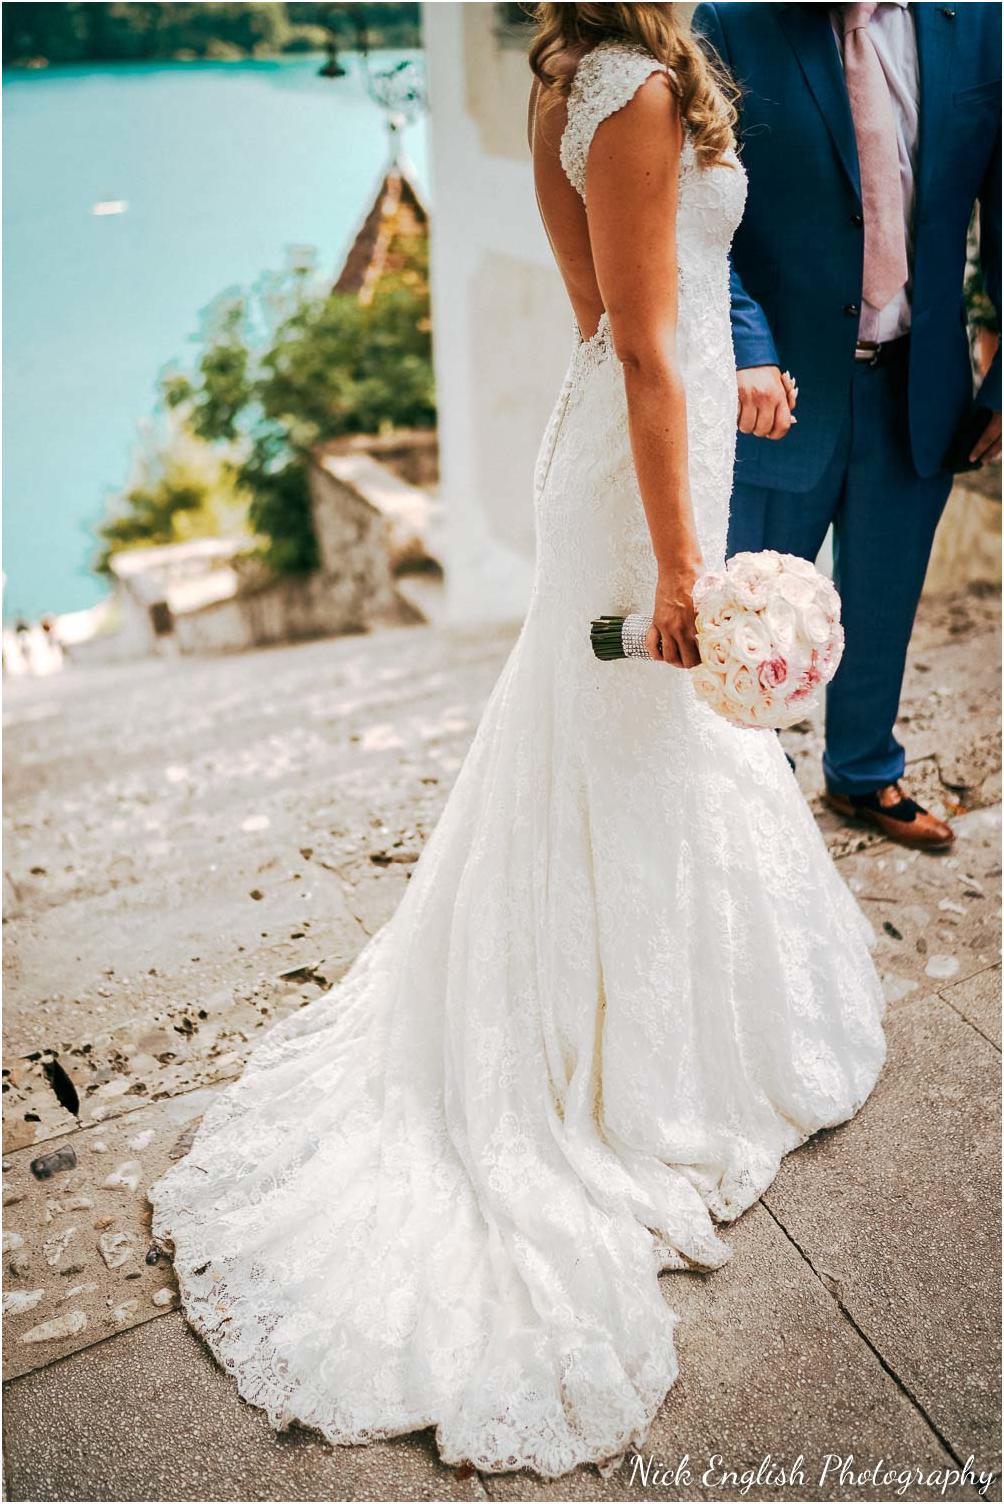 Destination_Wedding_Photographer_Slovenia_Nick_English_Photography-70-13.jpg